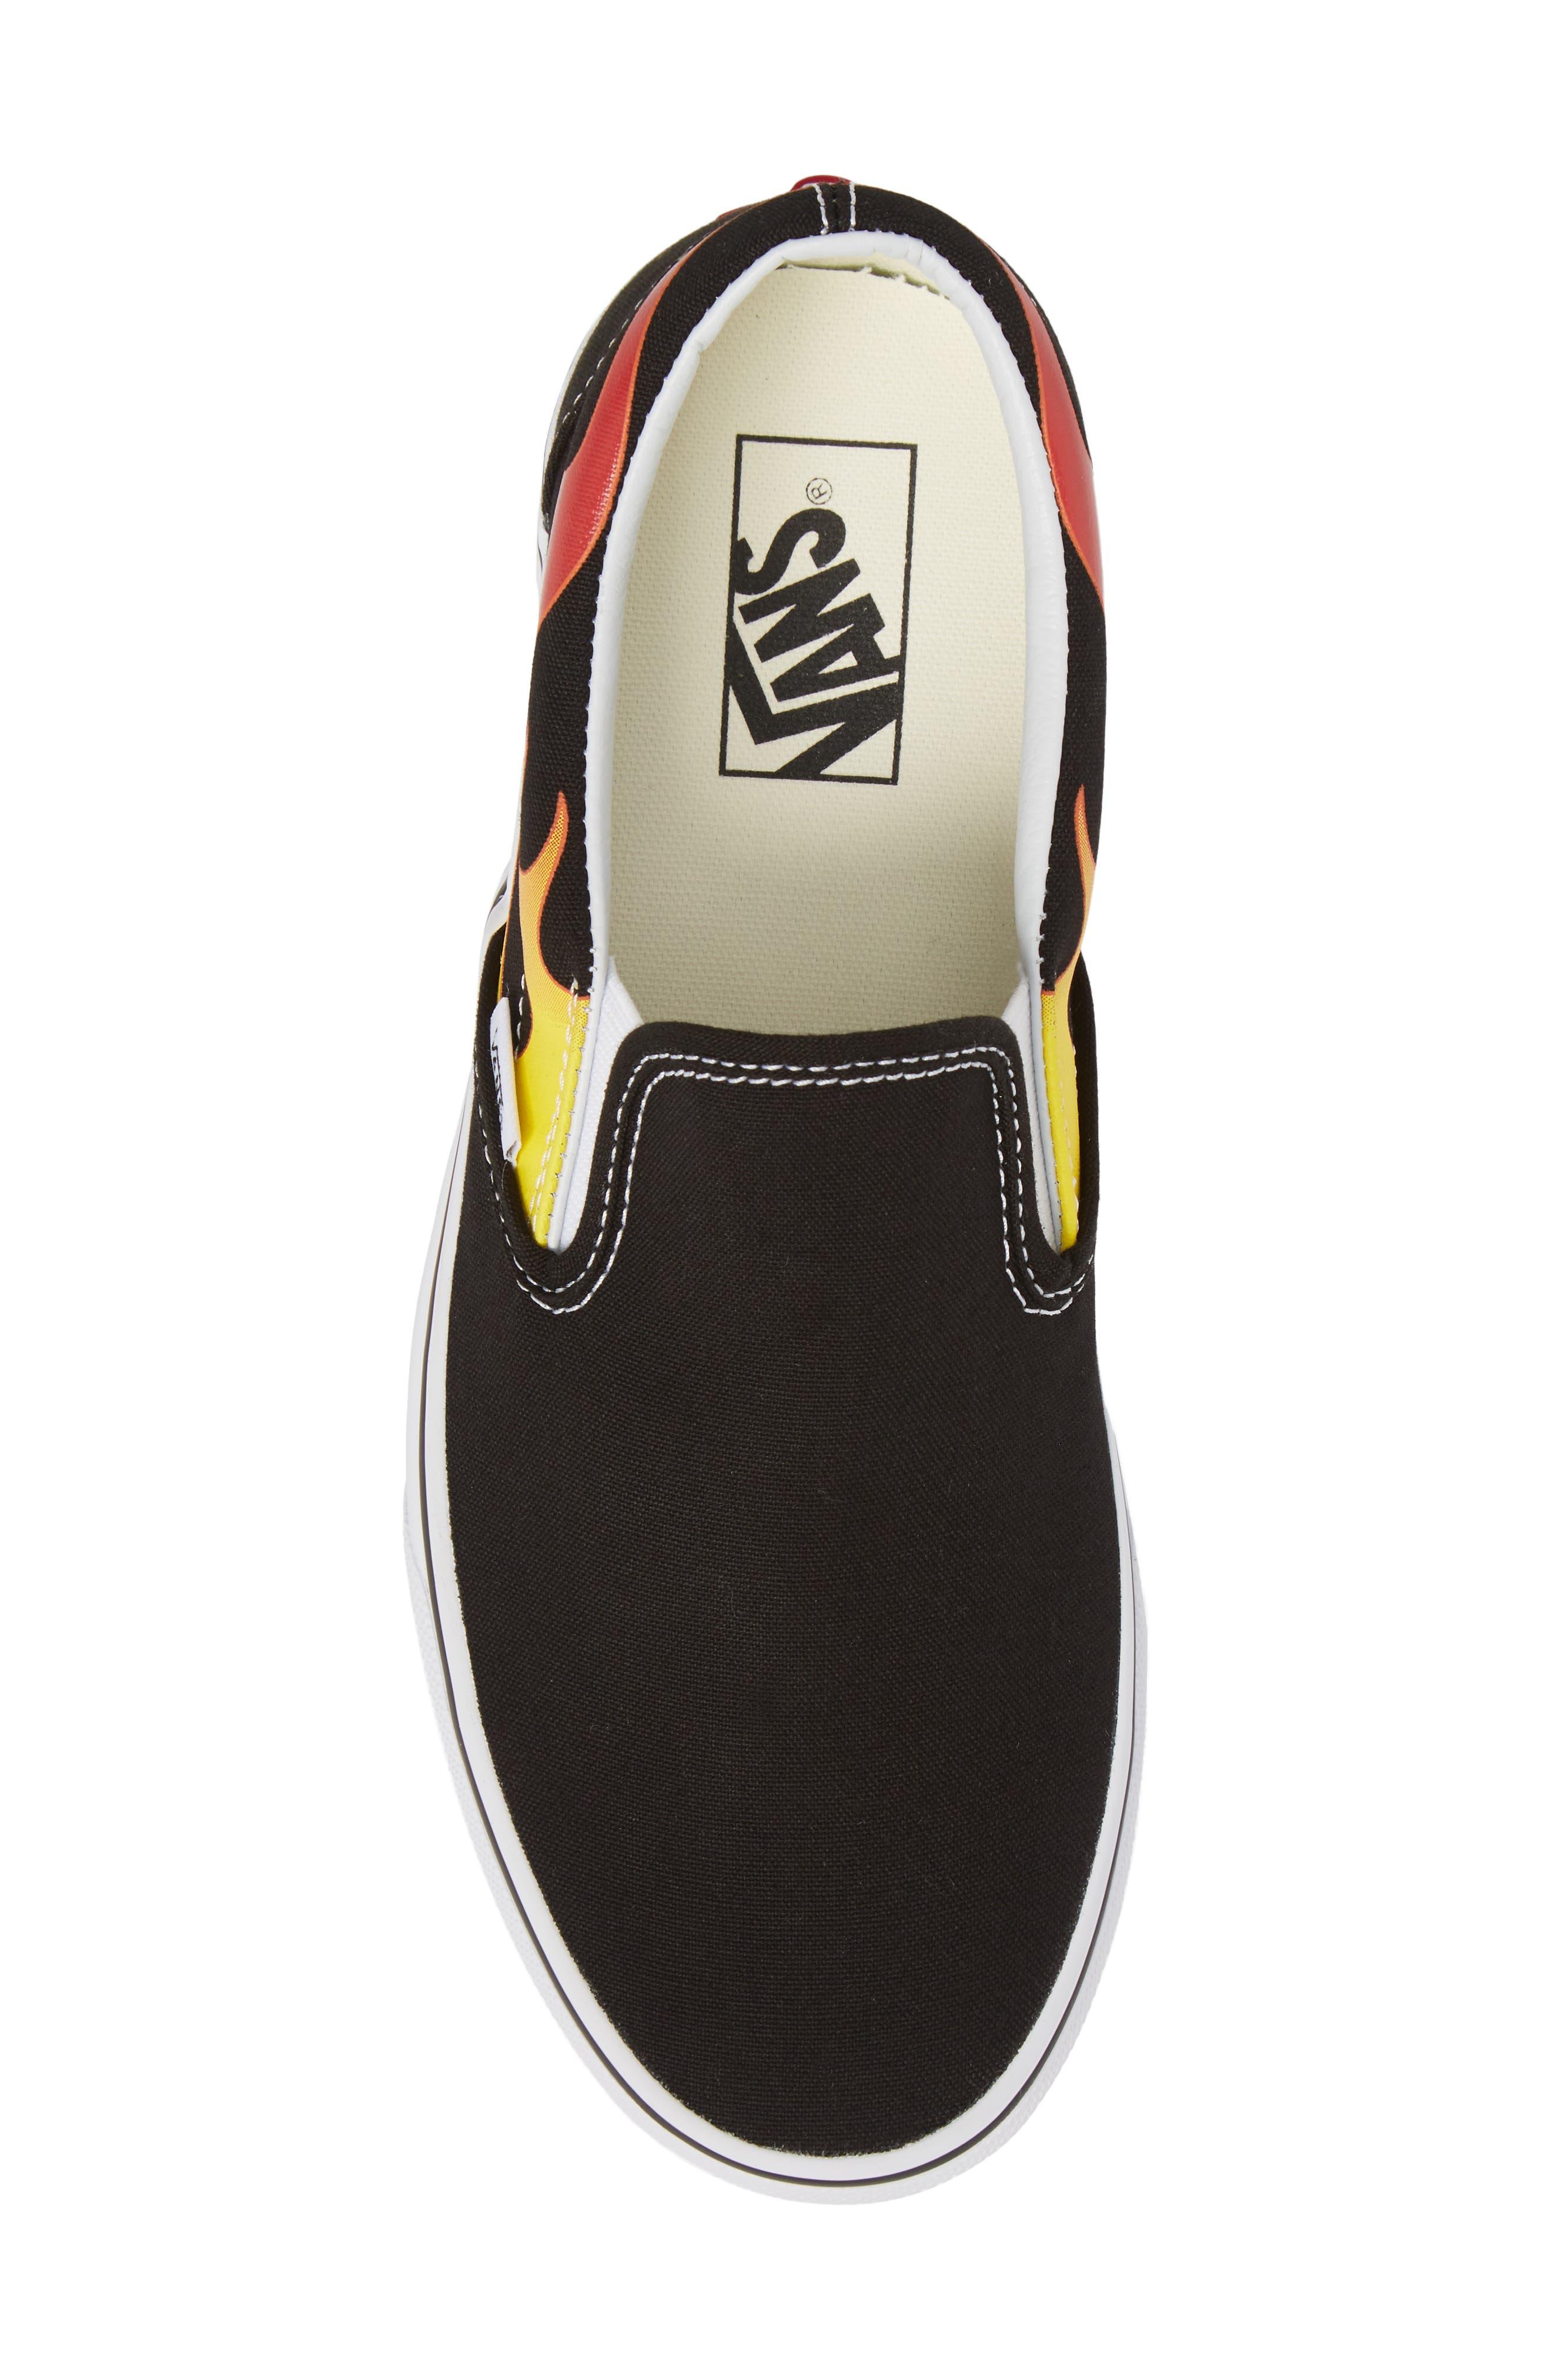 UA Classic Slip-On Sneaker,                             Alternate thumbnail 5, color,                             Black/ Black/ True White